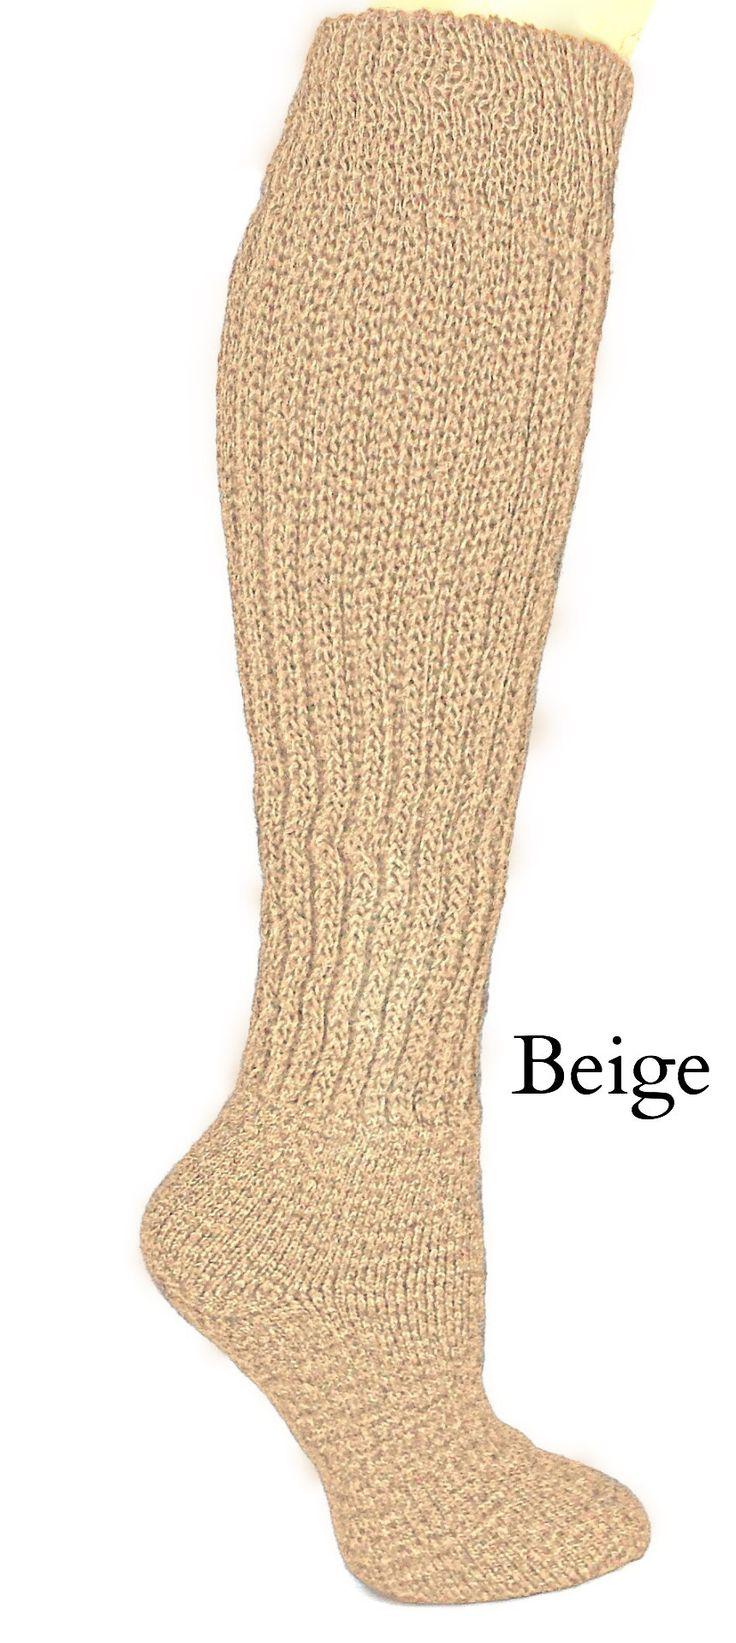 Therapeutic Alpaca Socks - Over the Calf - Diabetic, Neuropathy, Large Calf Socks